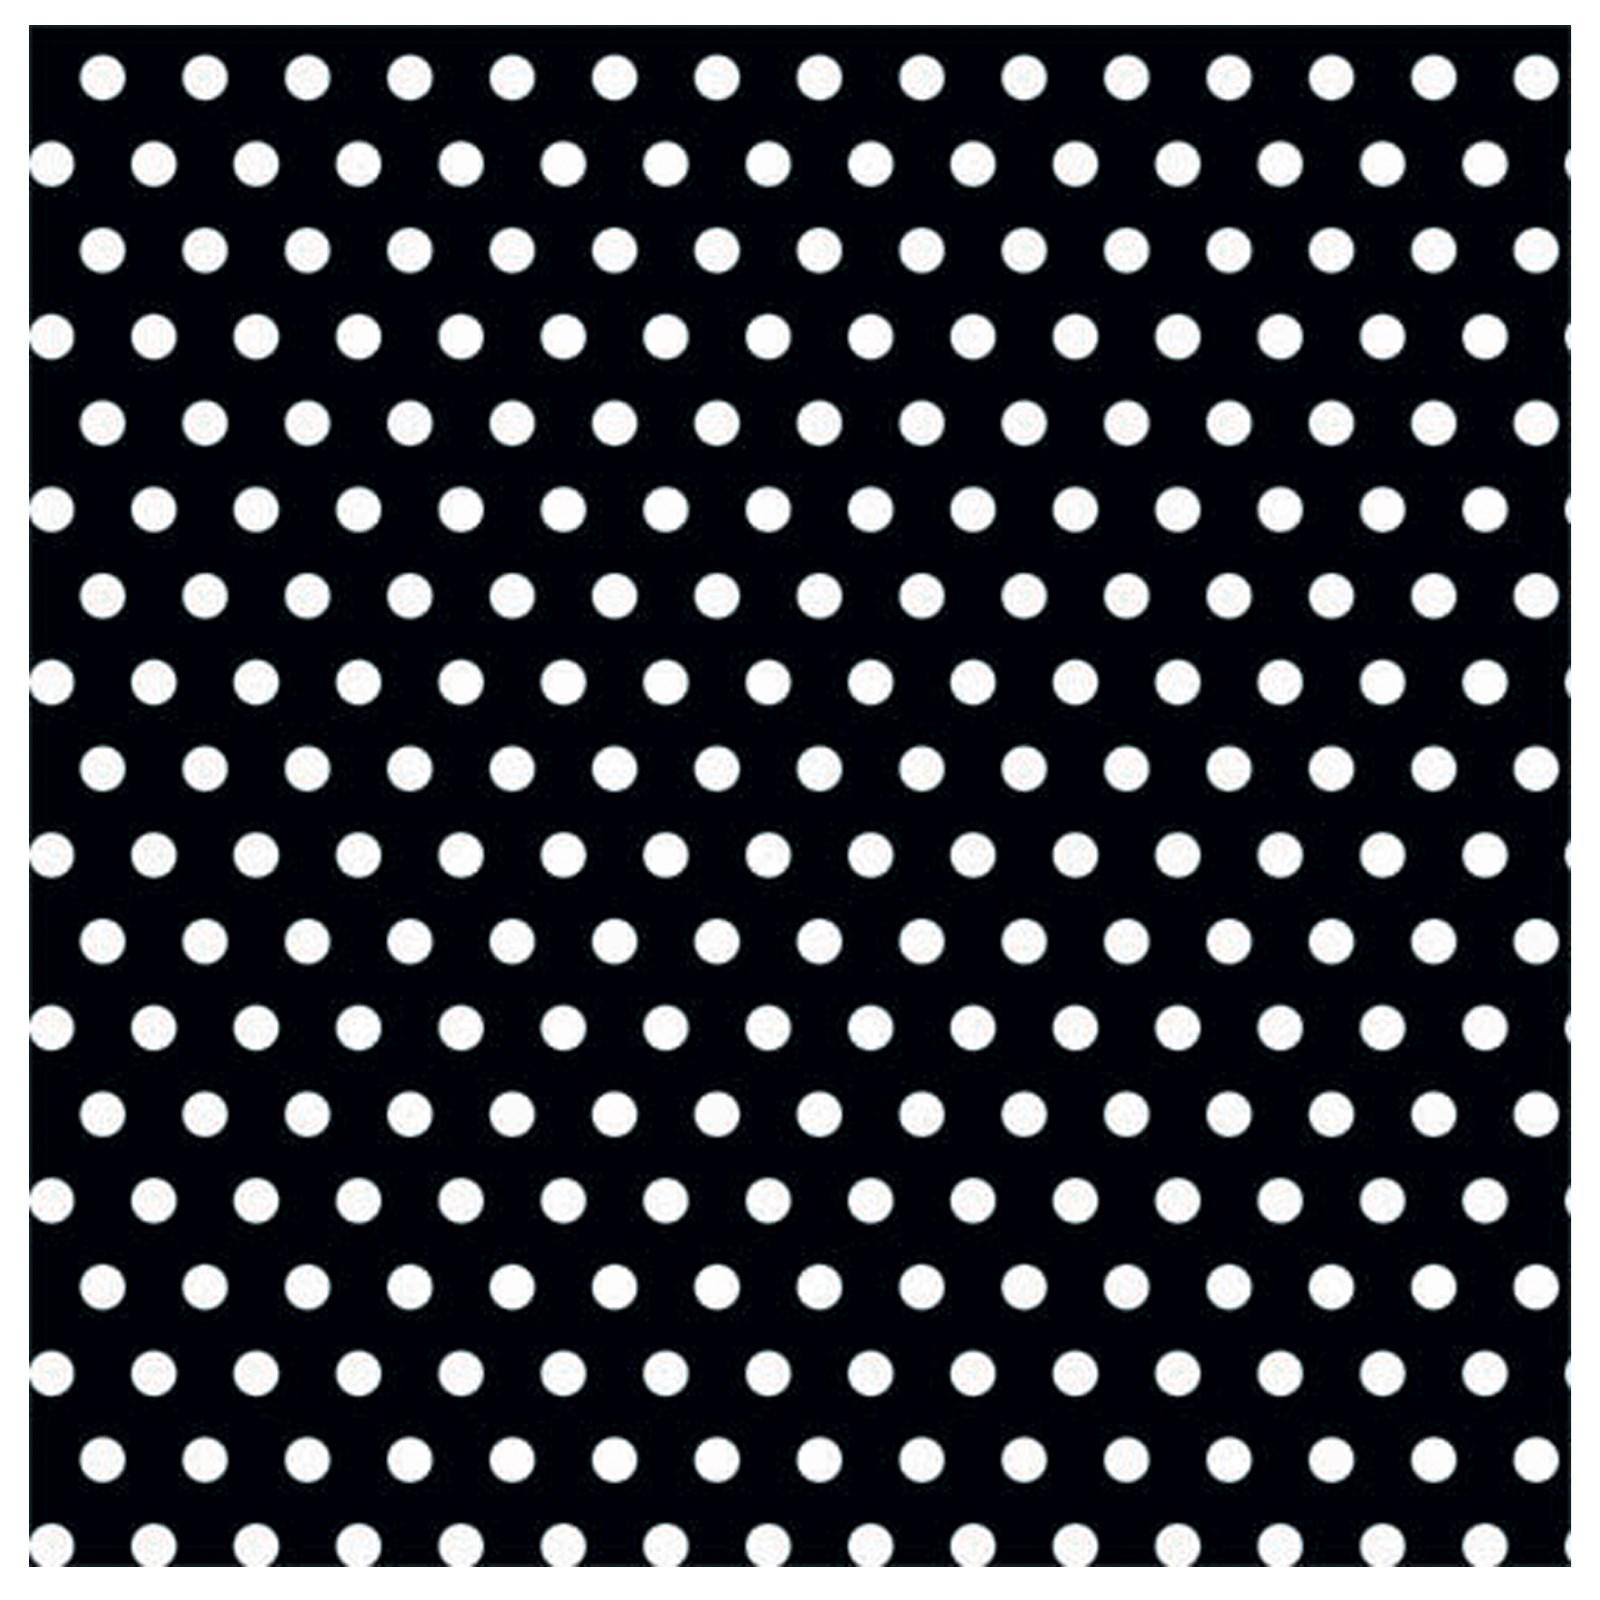 Solid color pattern polka dots black with polka dots jumbo gift wrap